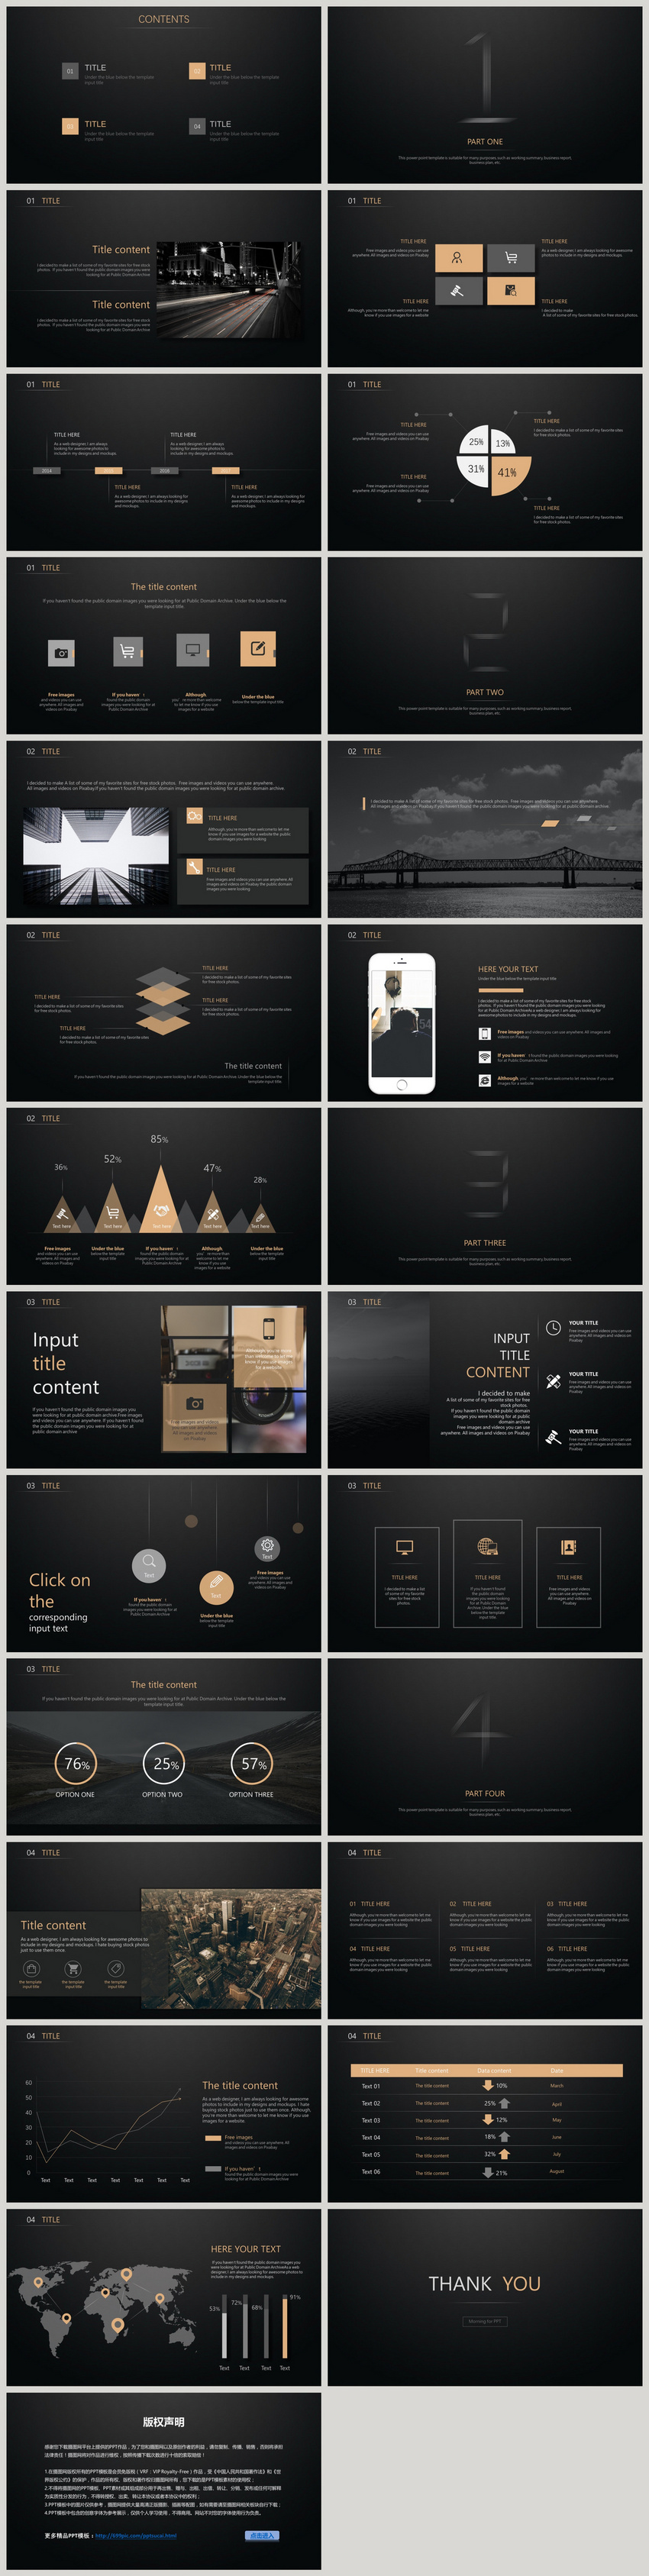 Simple atmosphere black elegant business general ppt template ...